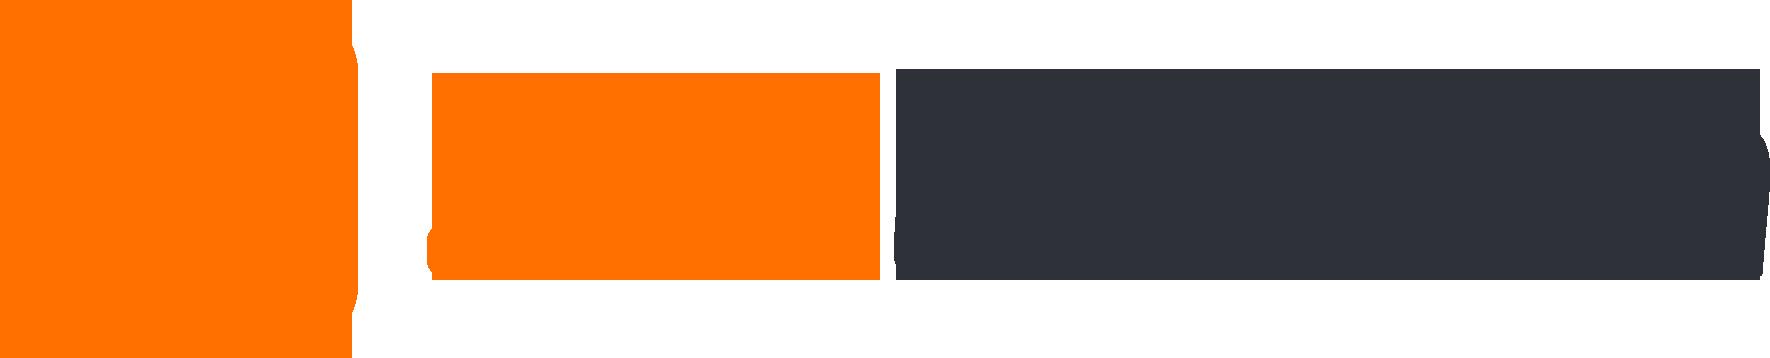 2ndkitchen-logo